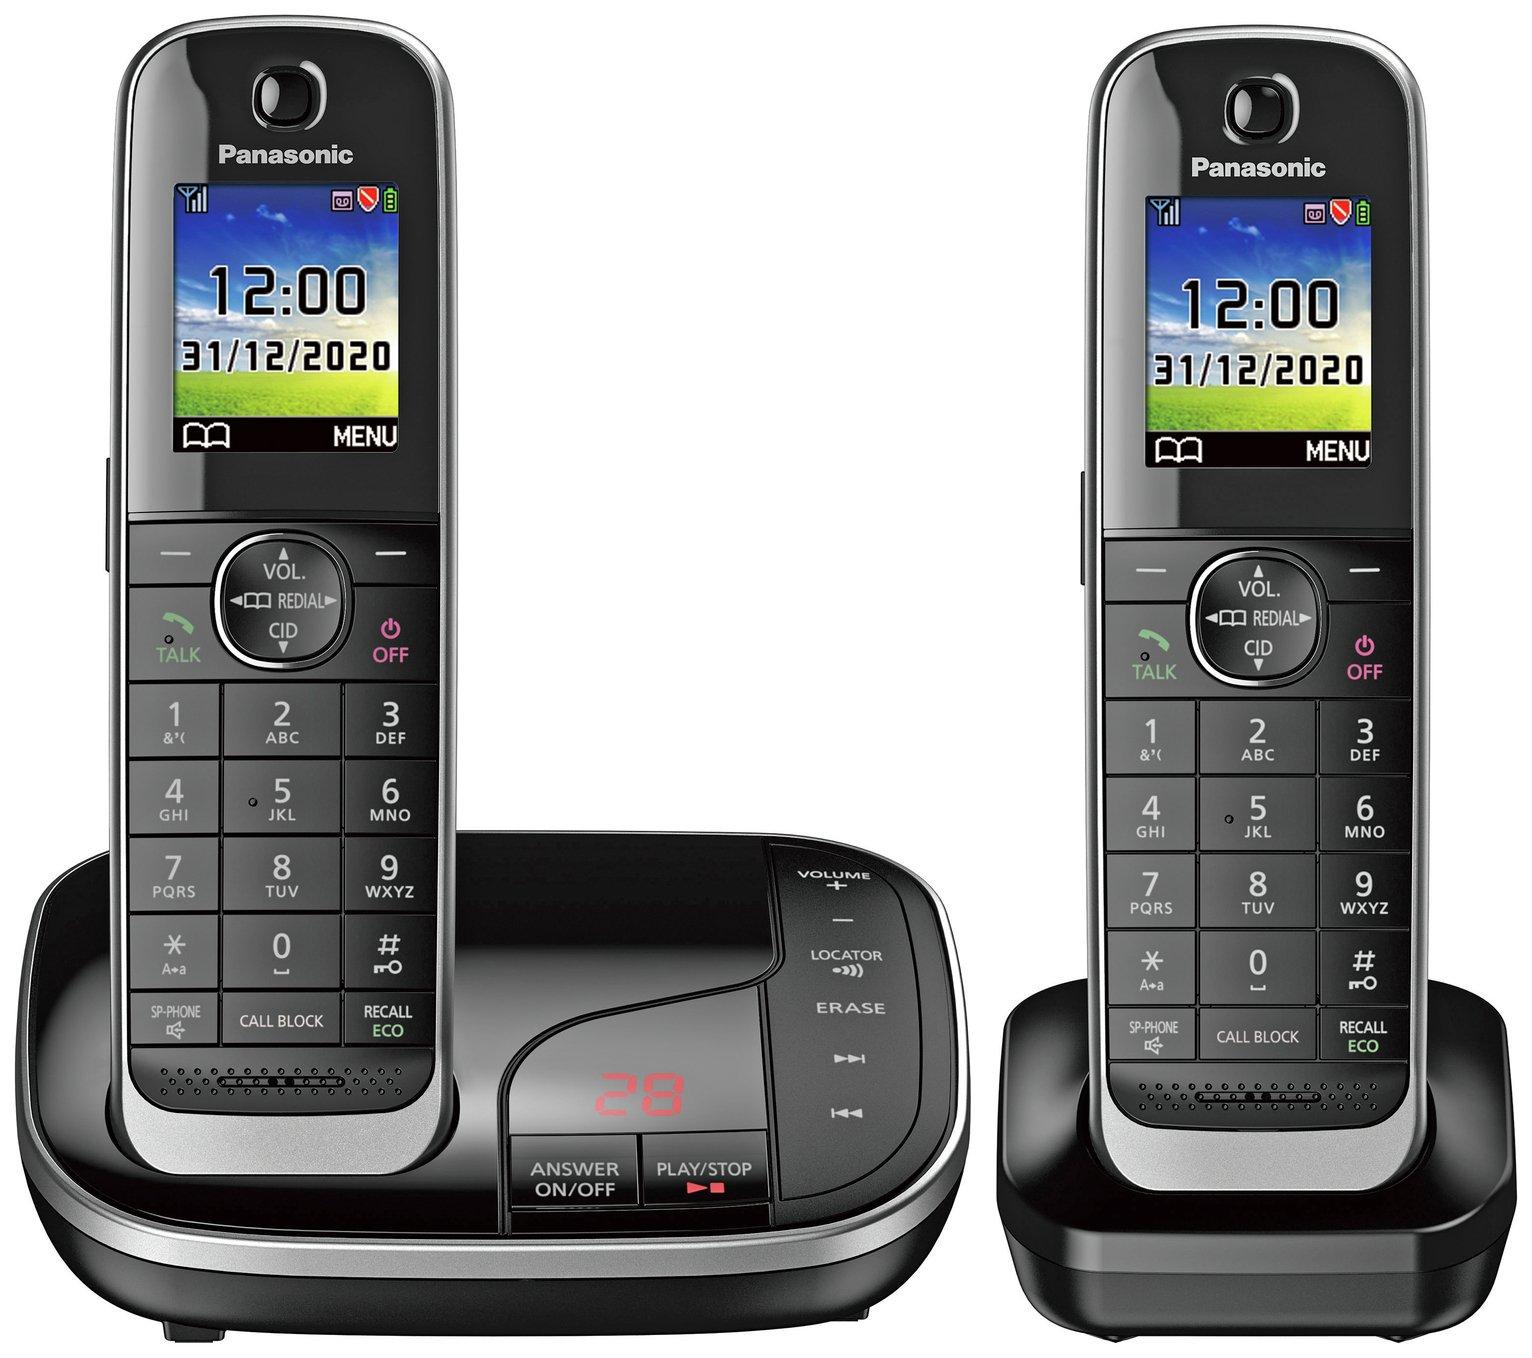 Panasonic Cordless Telephone with Answer Machine - Twin